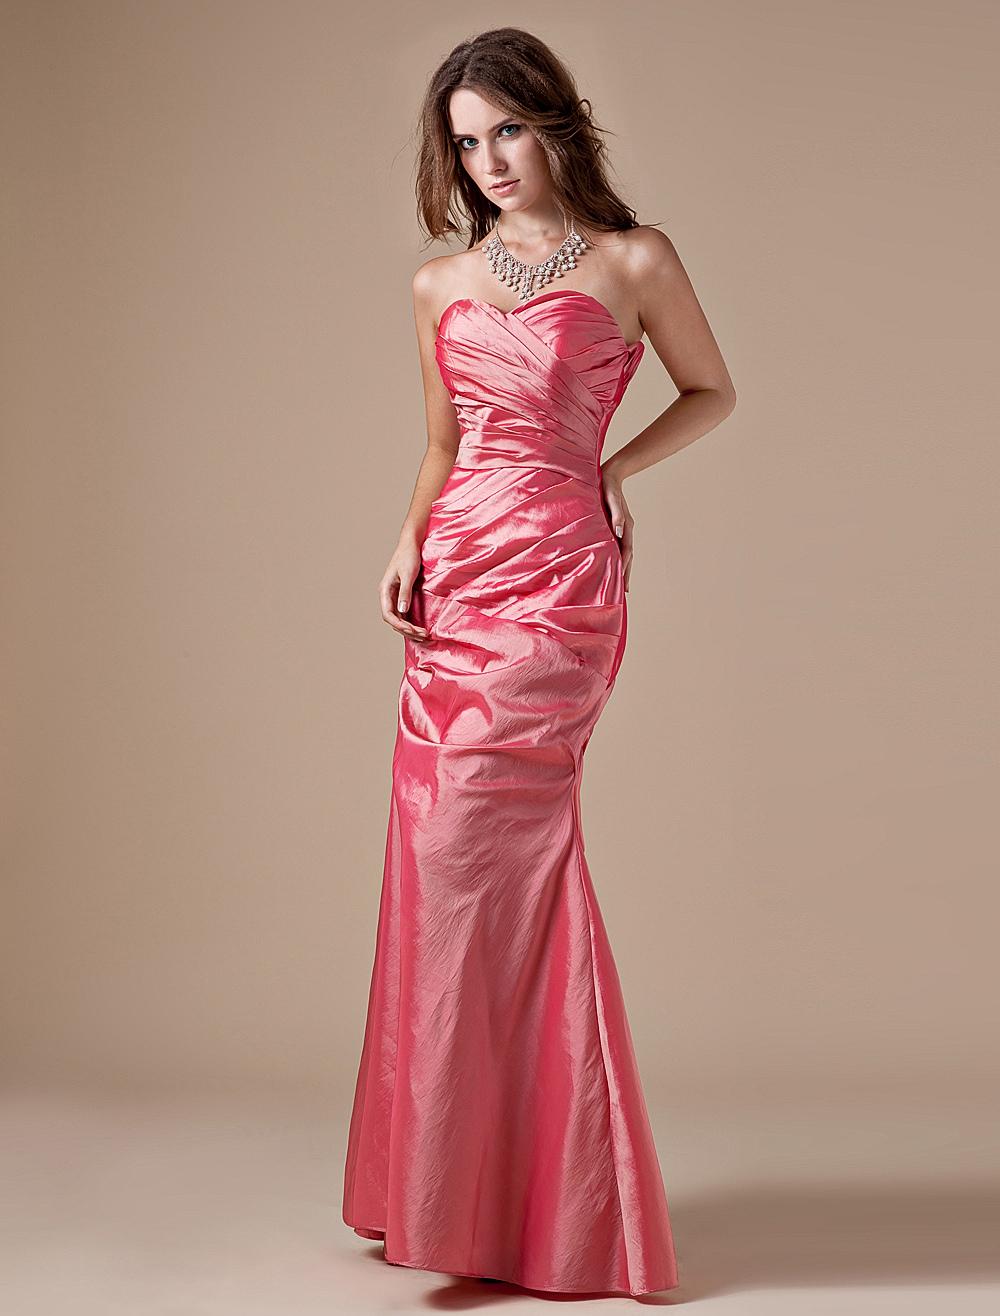 Sweetheart Bridesmaid Dress Pleated Taffeta Salmon Strapless Maxi Evening Dress